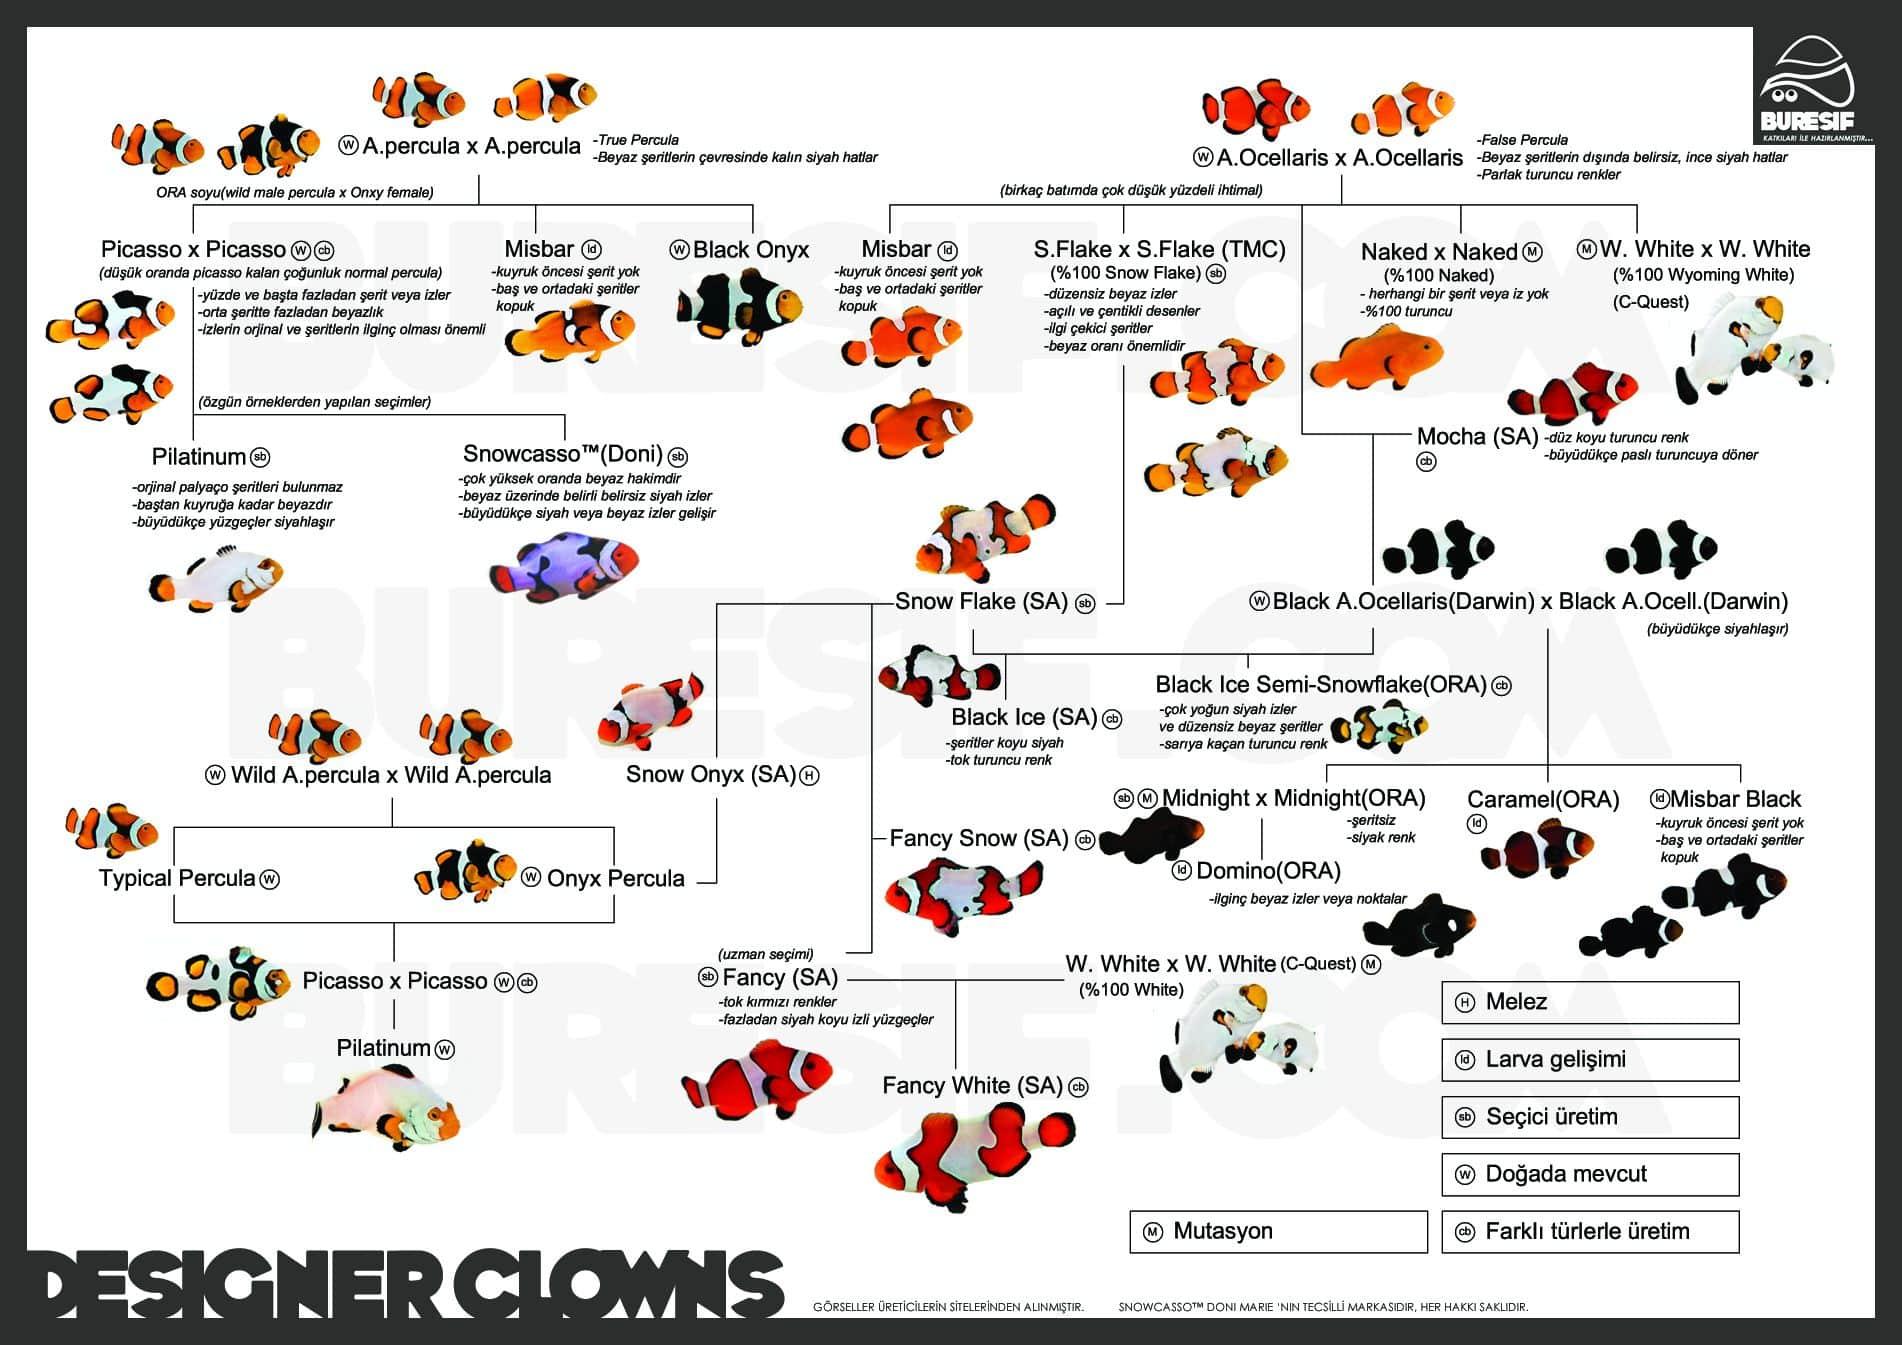 Amphiprion ocellaris (Peixe Palhaço) variedades